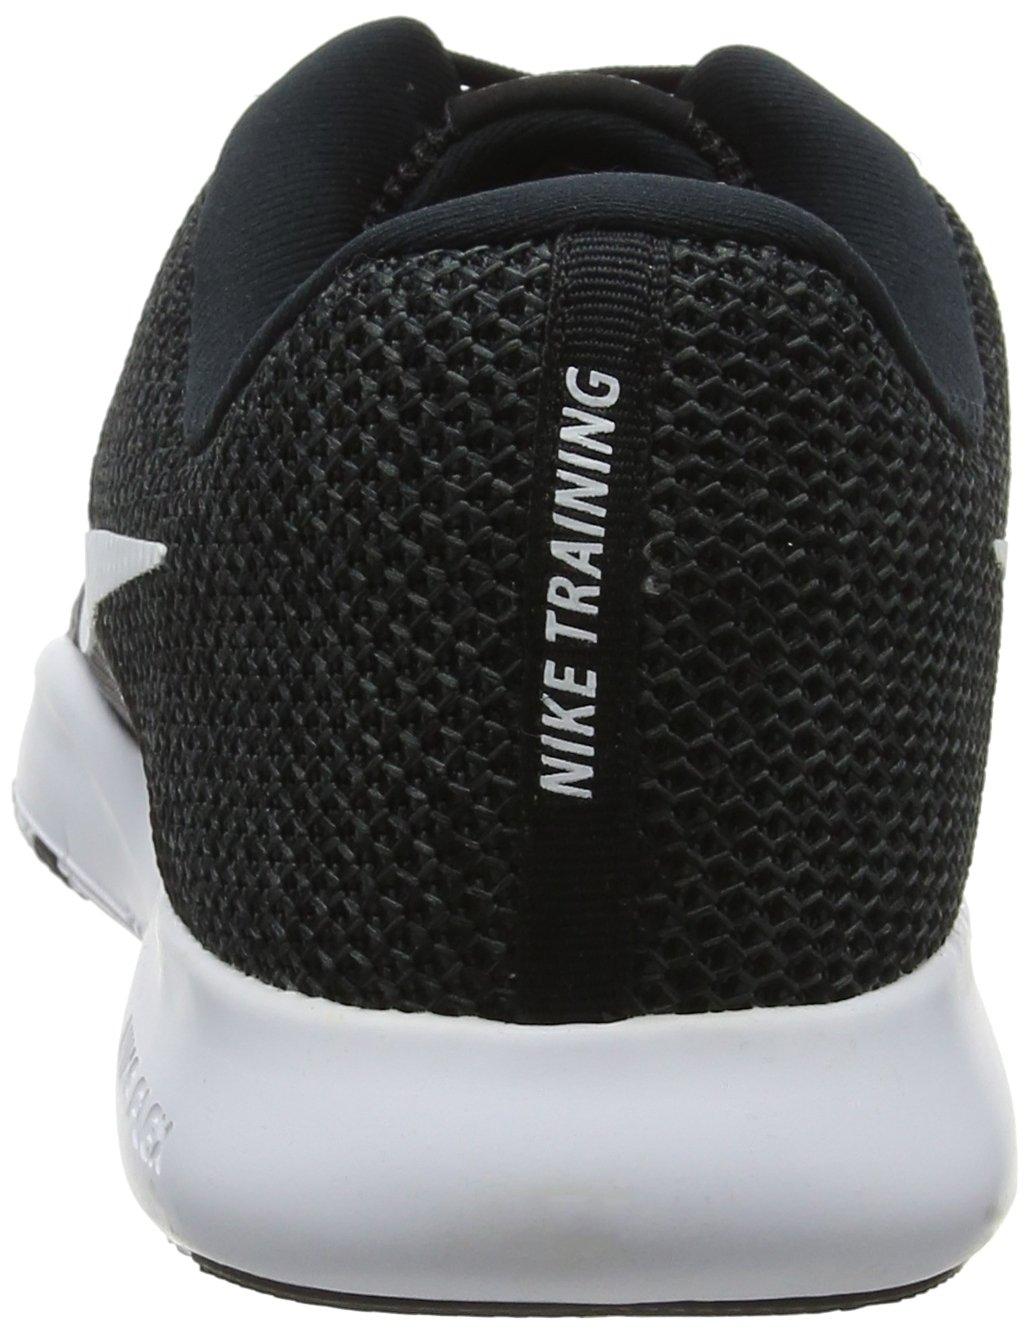 NIKE Women's Flex 8 Cross Trainer B000G4JTGQ 5.5 B(M) US|Black/White - Anthracite